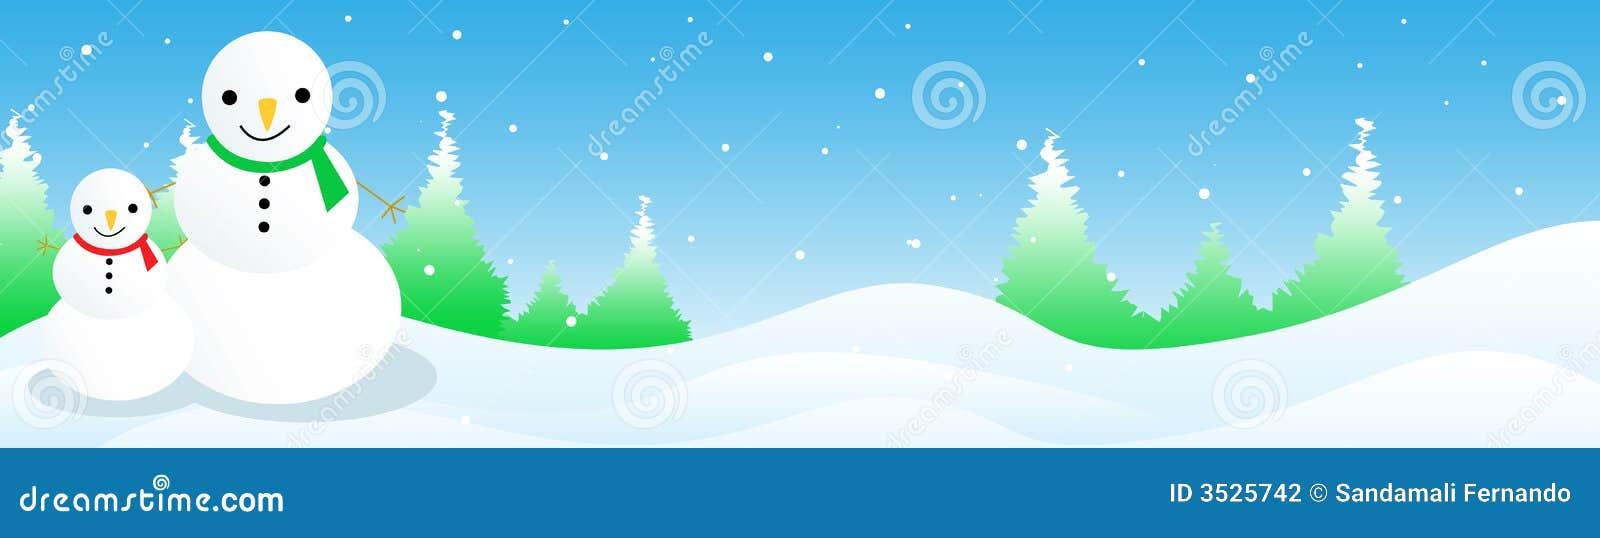 Christmas Header Clipart.Christmas Header Banner Stock Illustration Illustration